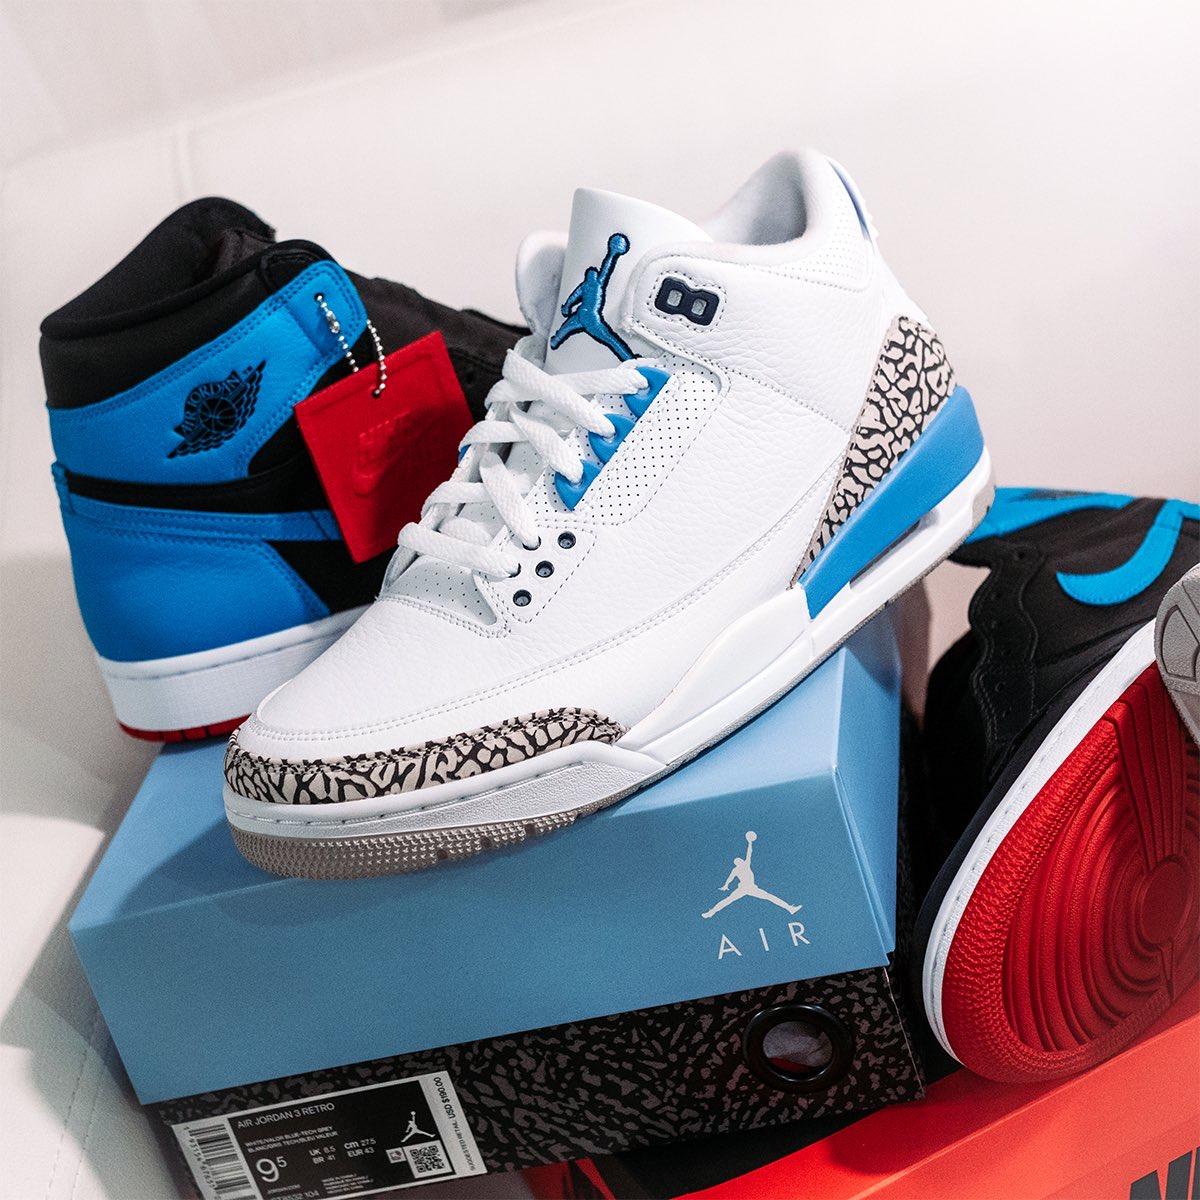 AJ3,Air Jordan 3,CT8532-104,发售 曾经的天价 PE 配色,还是全新鞋盒!北卡 AJ3 最新实物谍照释出!